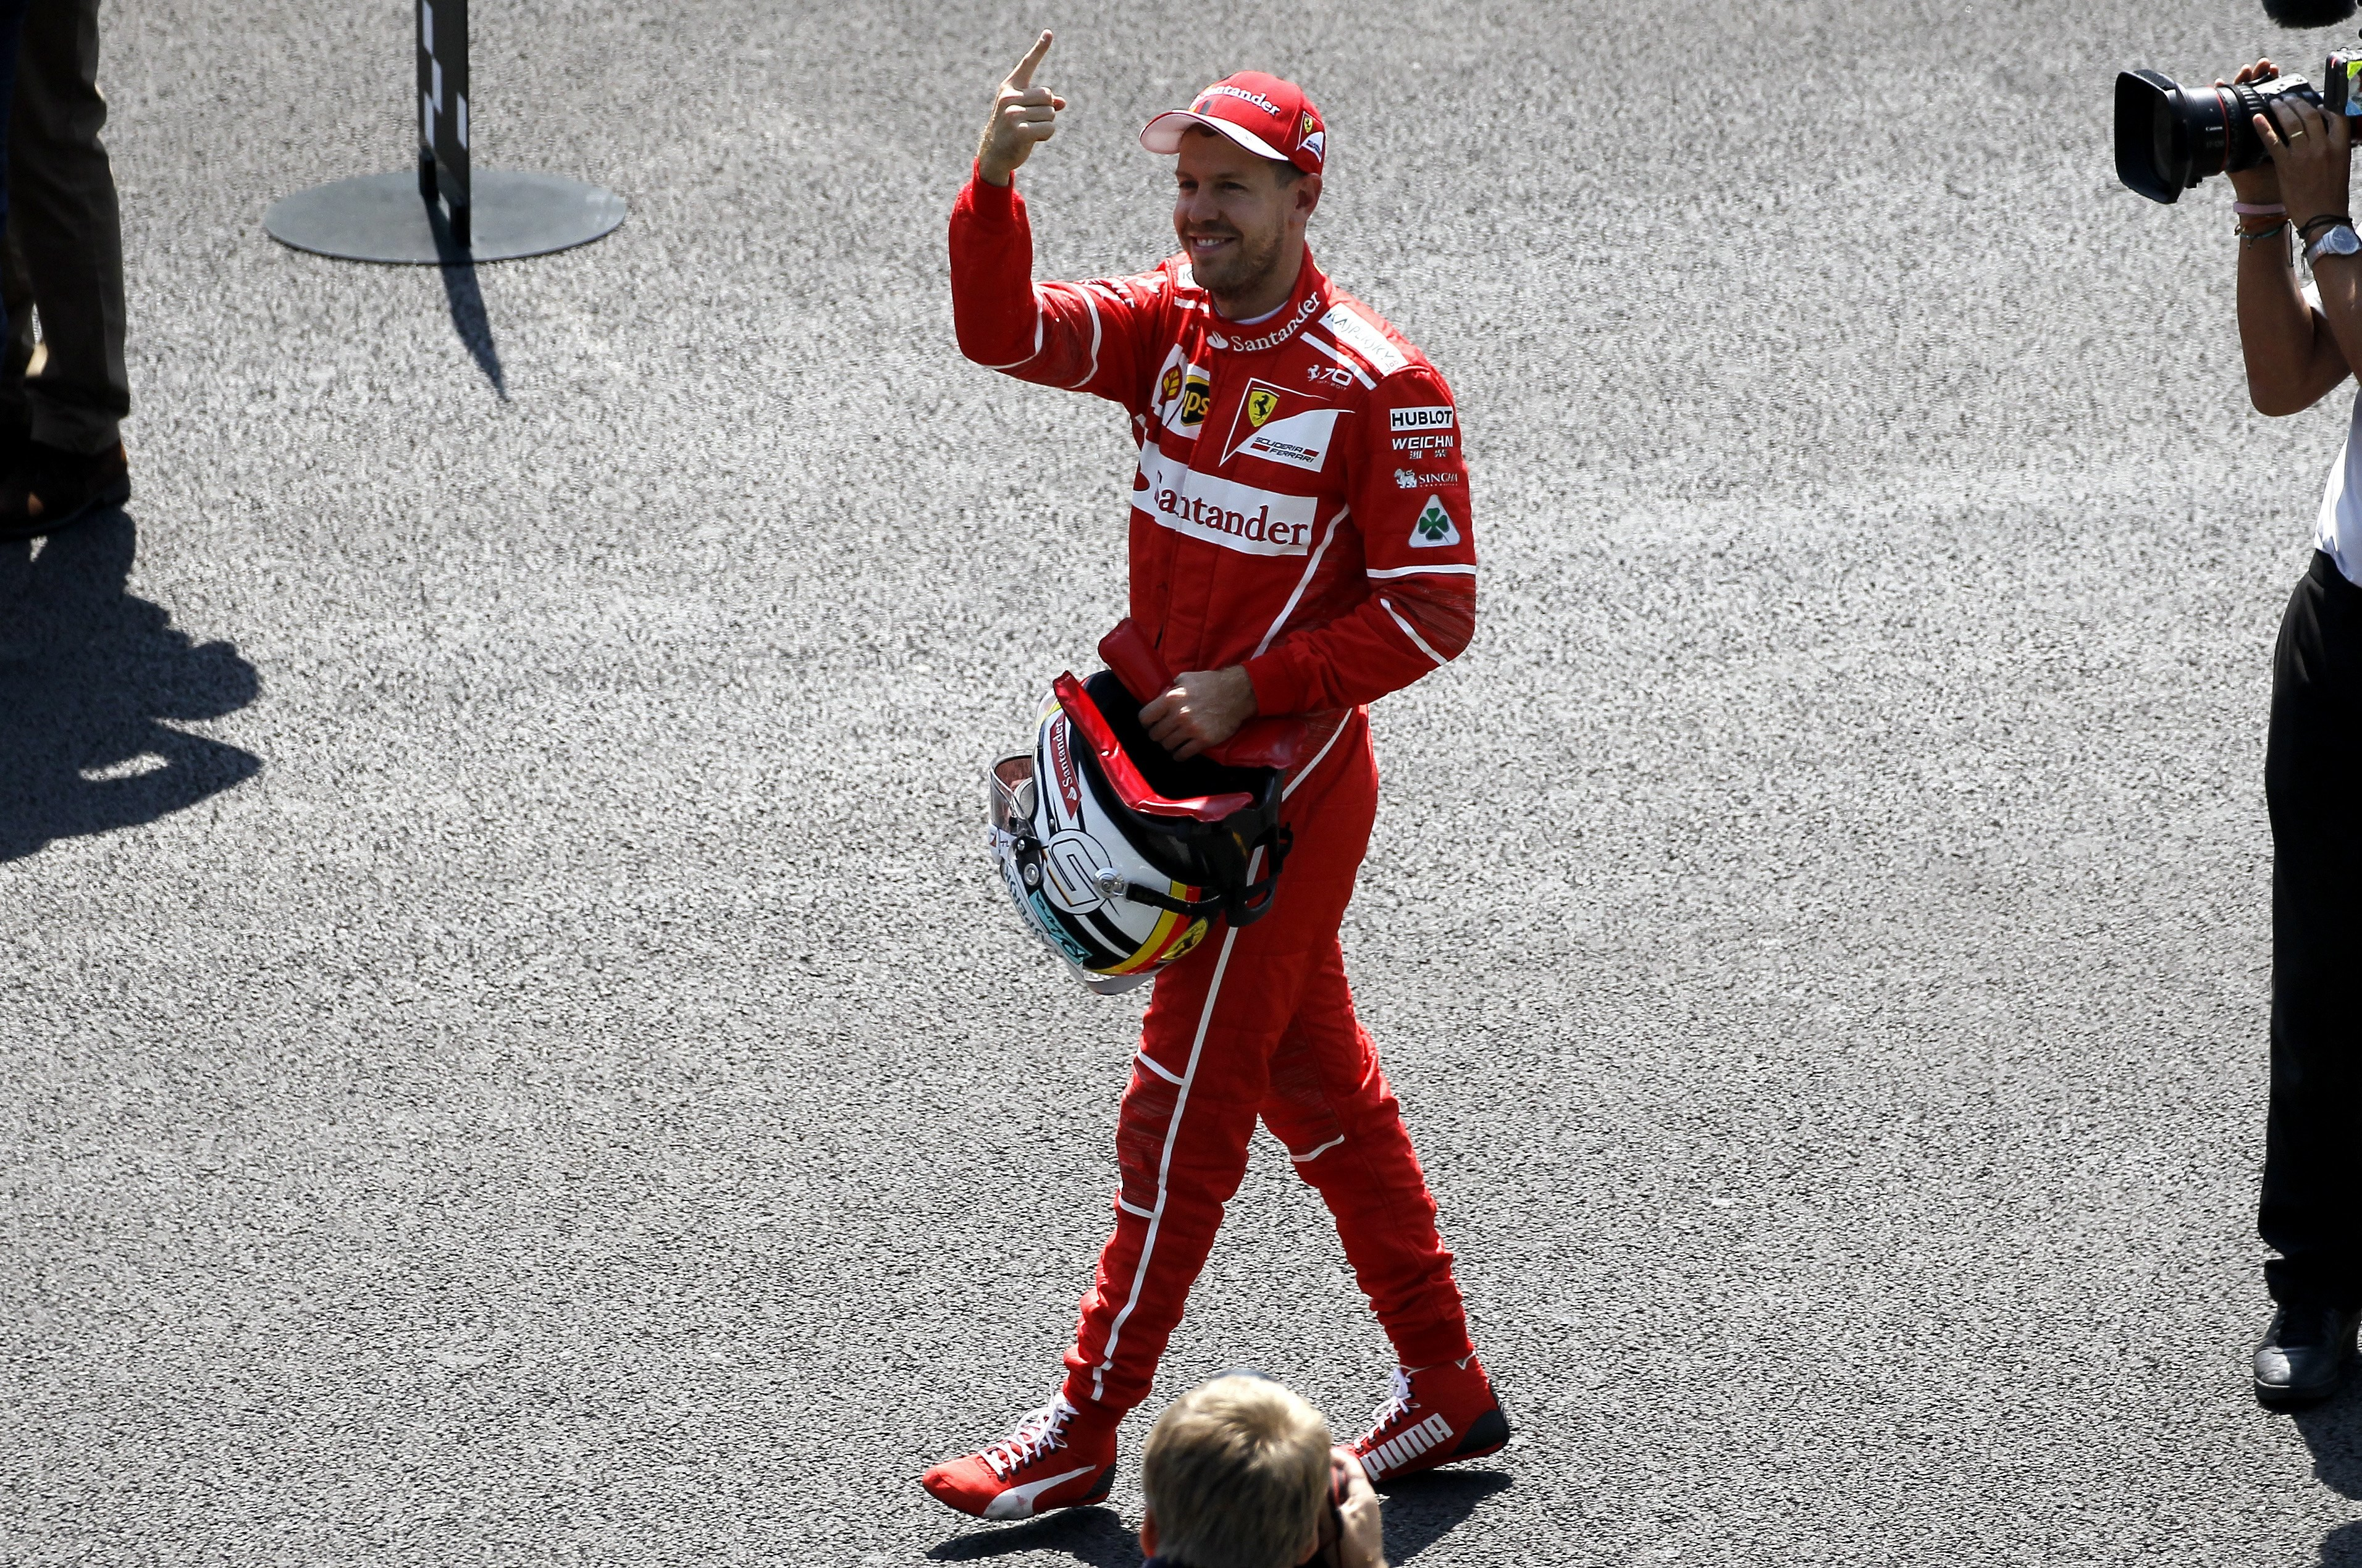 50 Pole Position w karierze Sebastiana Vettela Typy na GP Meksyku (wyścig) - STS